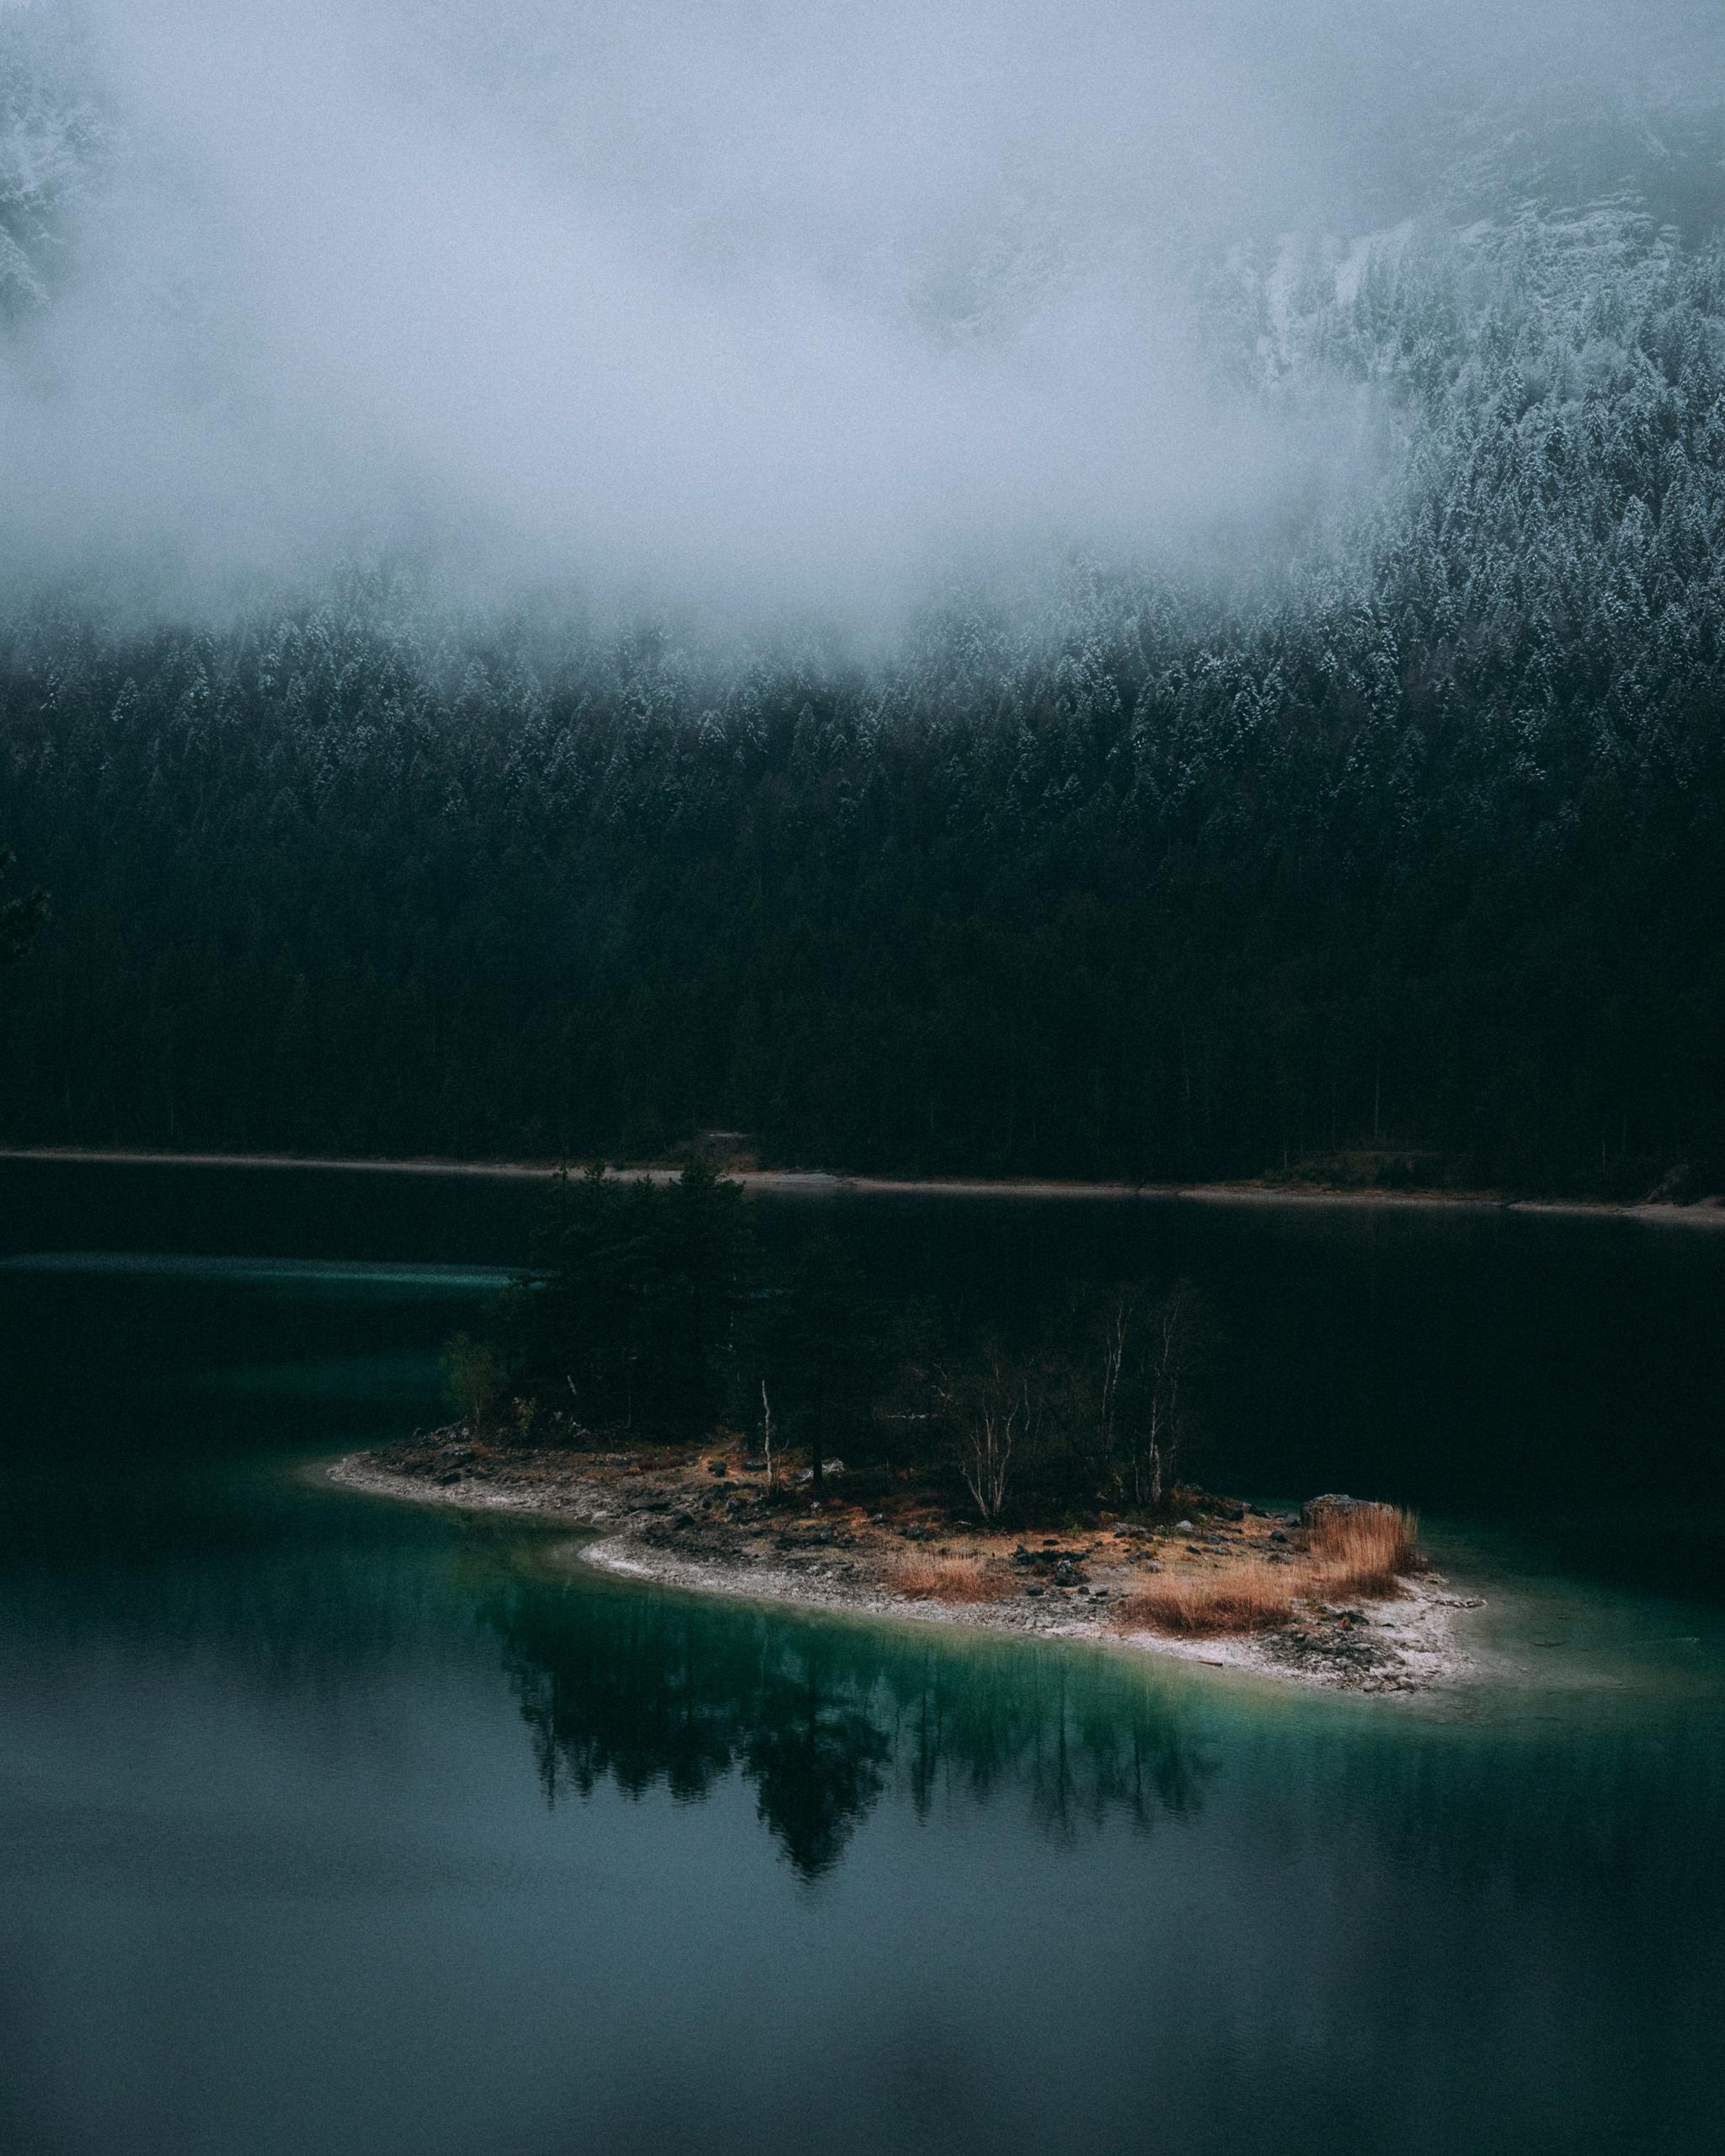 cold lonely mountainlake 6am - adventure - lavisuals | ello